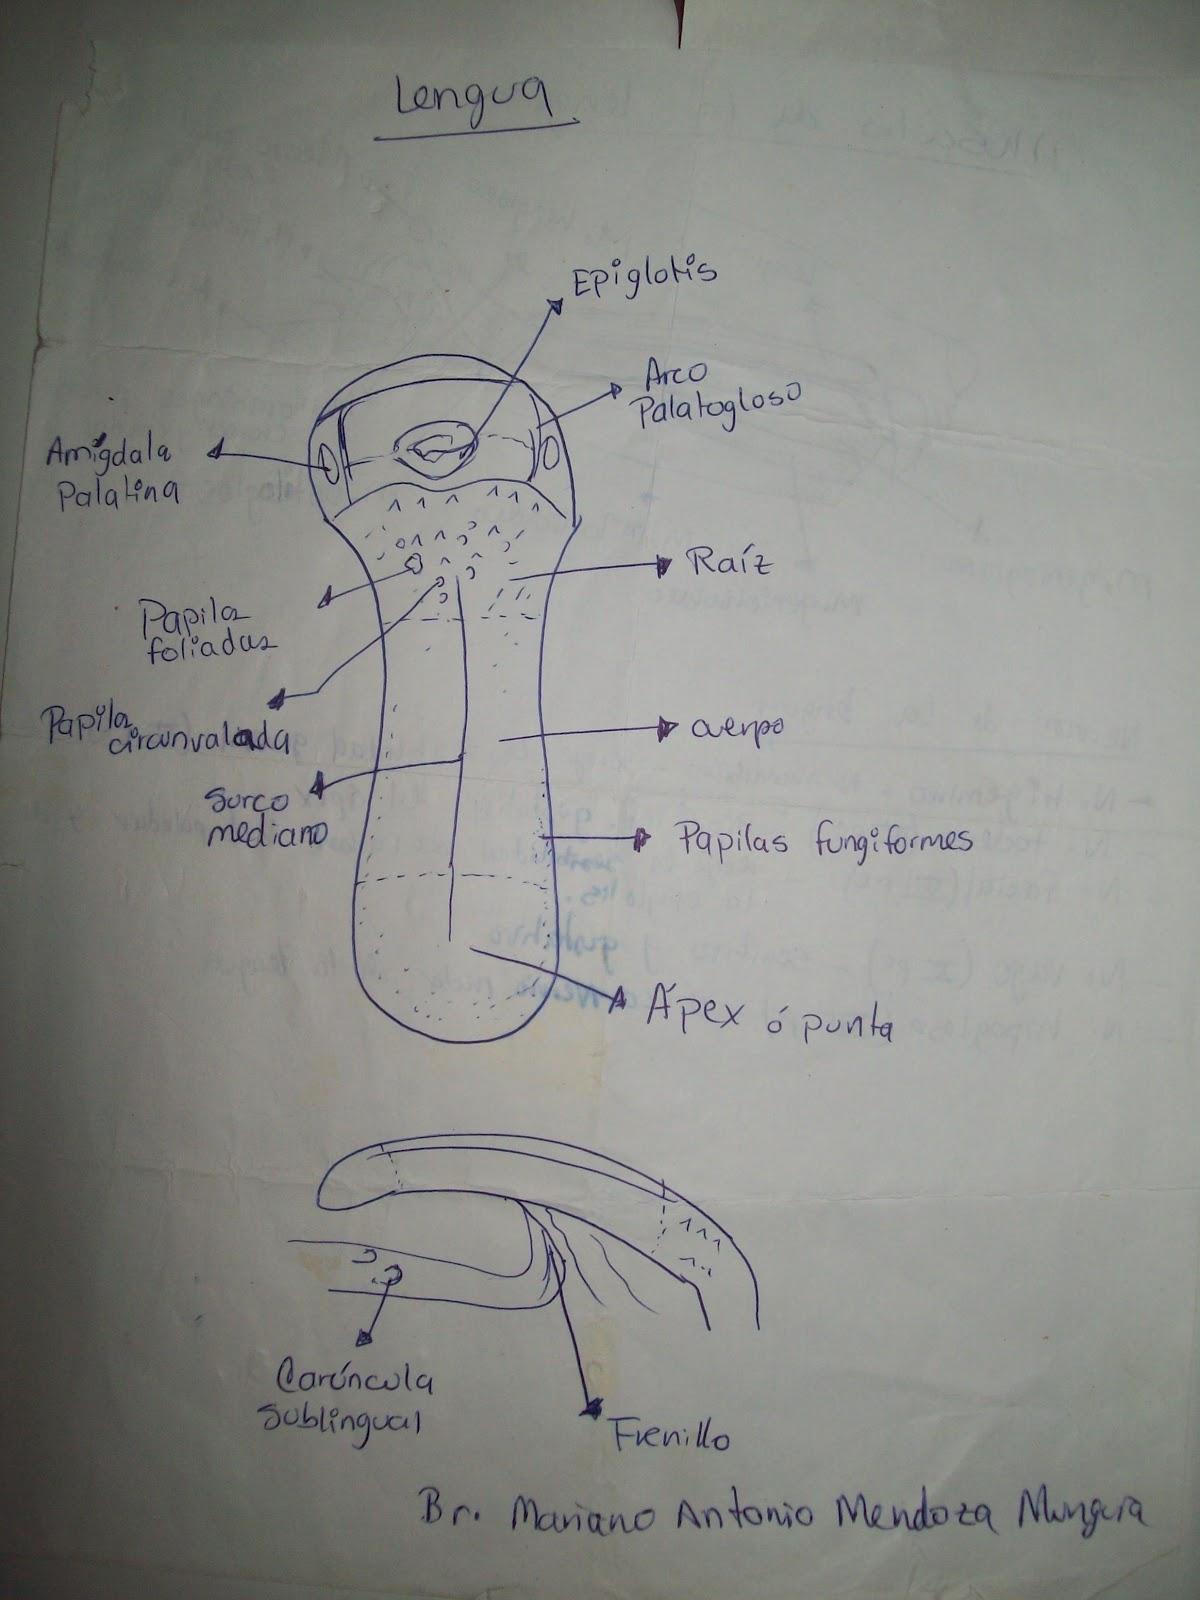 Animal Nica Med: Anatomía Veterinaria